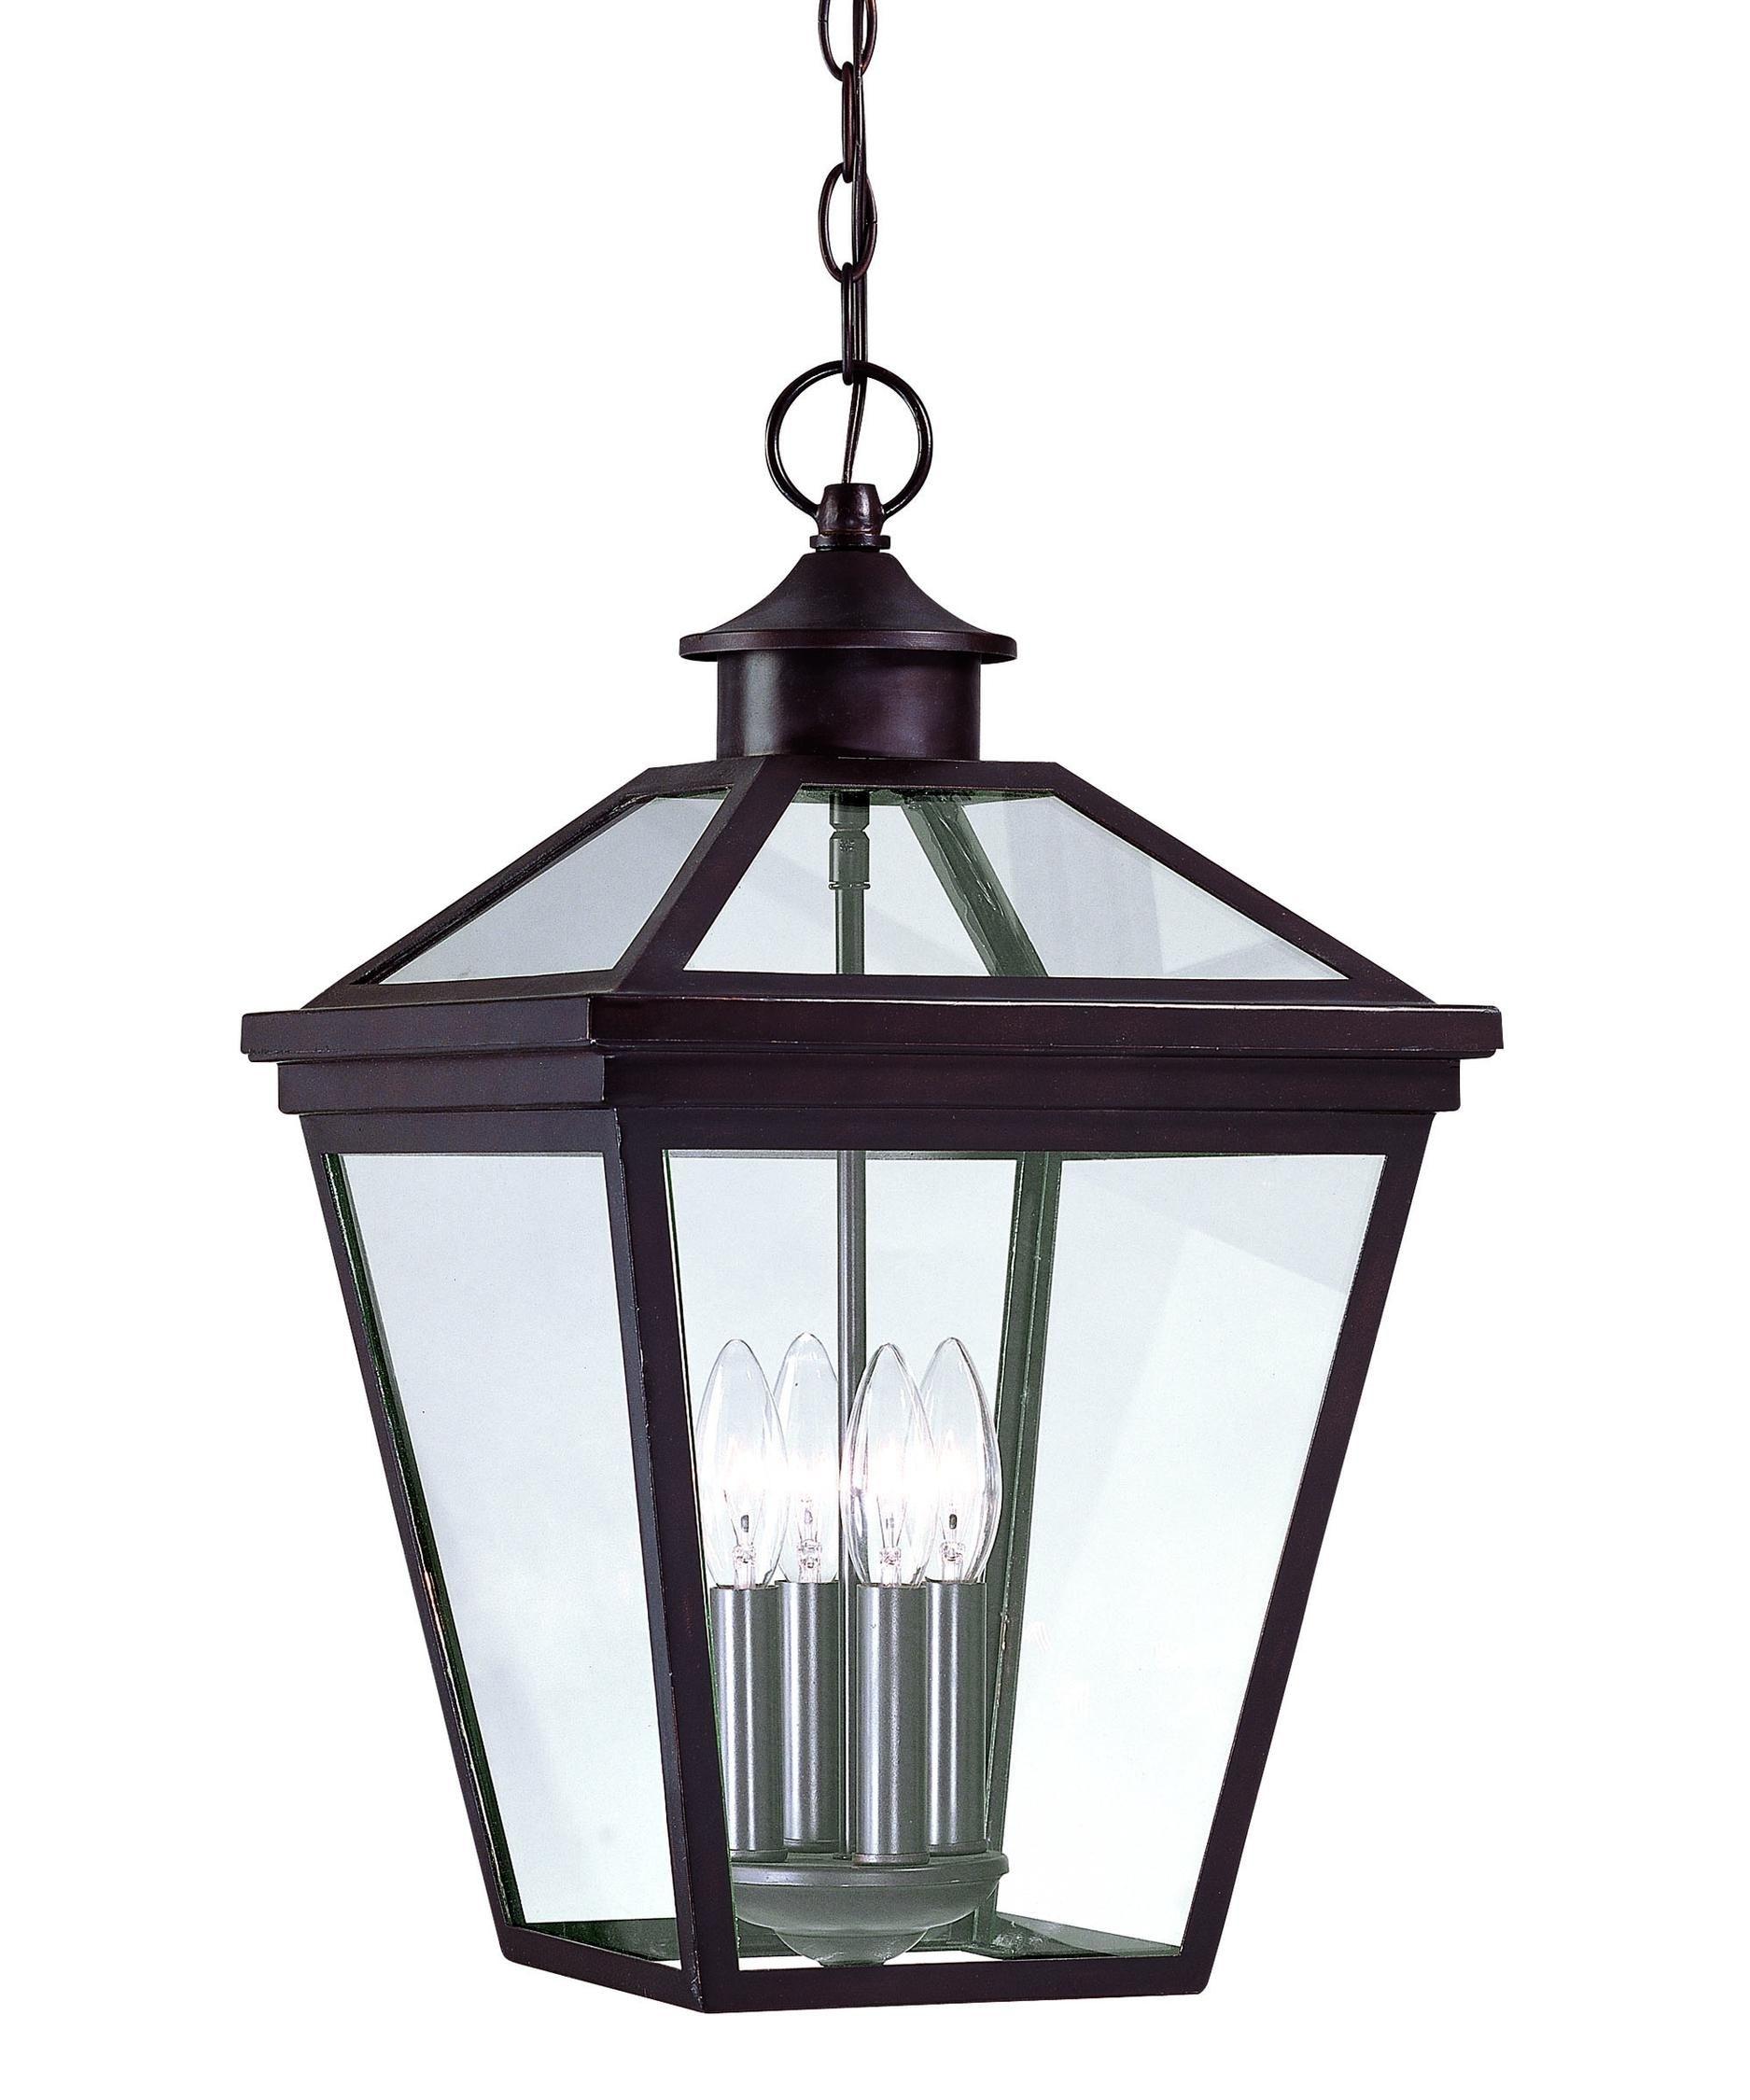 Savoy House Ellijay 4 Light Outdoor Hanging Lantern | Capitol Within Outdoor Hanging Wall Lanterns (View 7 of 15)